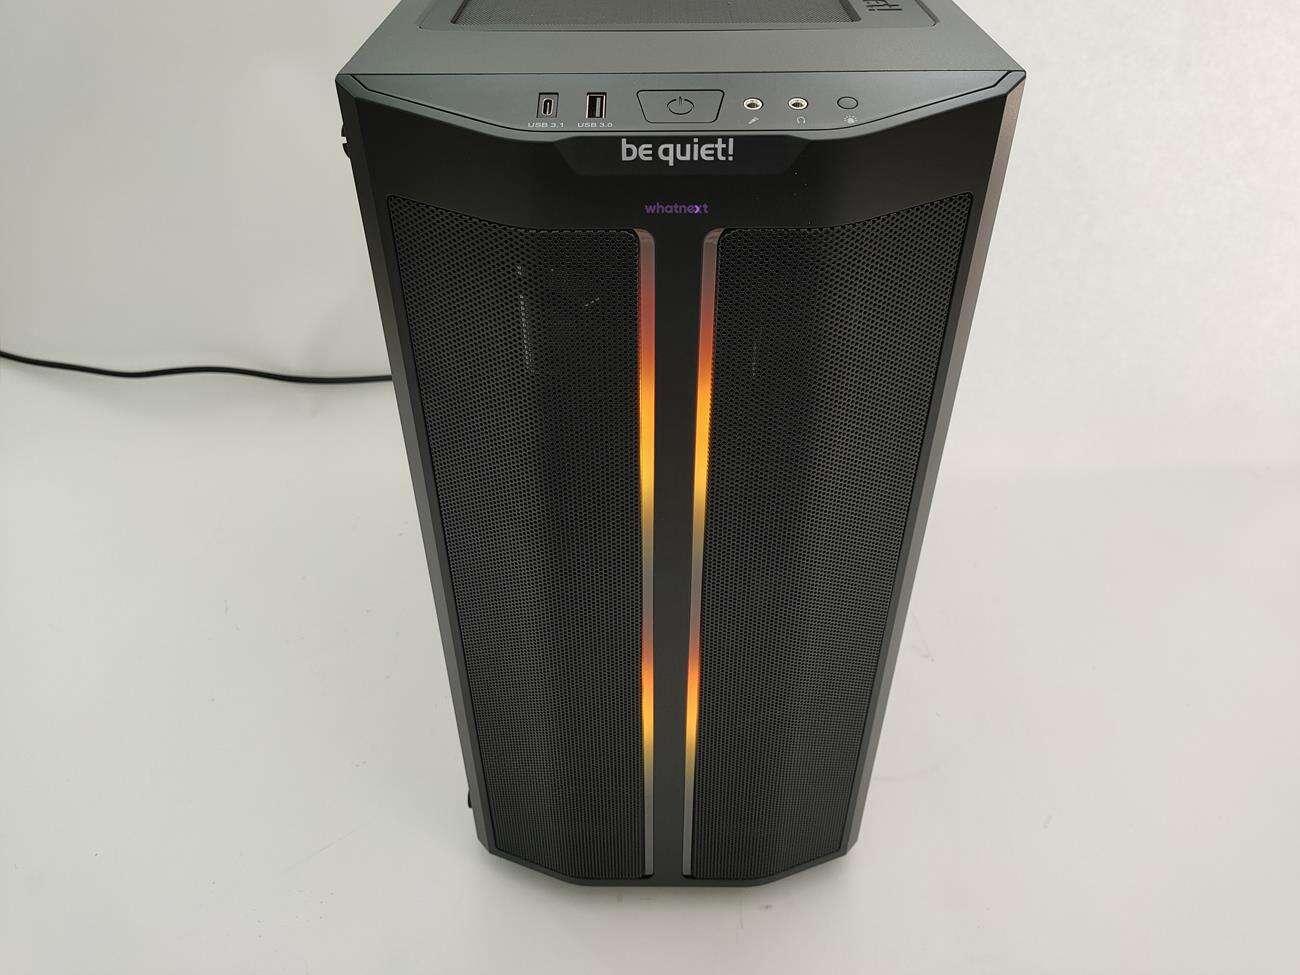 test be quiet! Pure Base 500DX, recenzja be quiet! Pure Base 500DX, review be quiet! Pure Base 500DX, opinia be quiet! Pure Base 500DX